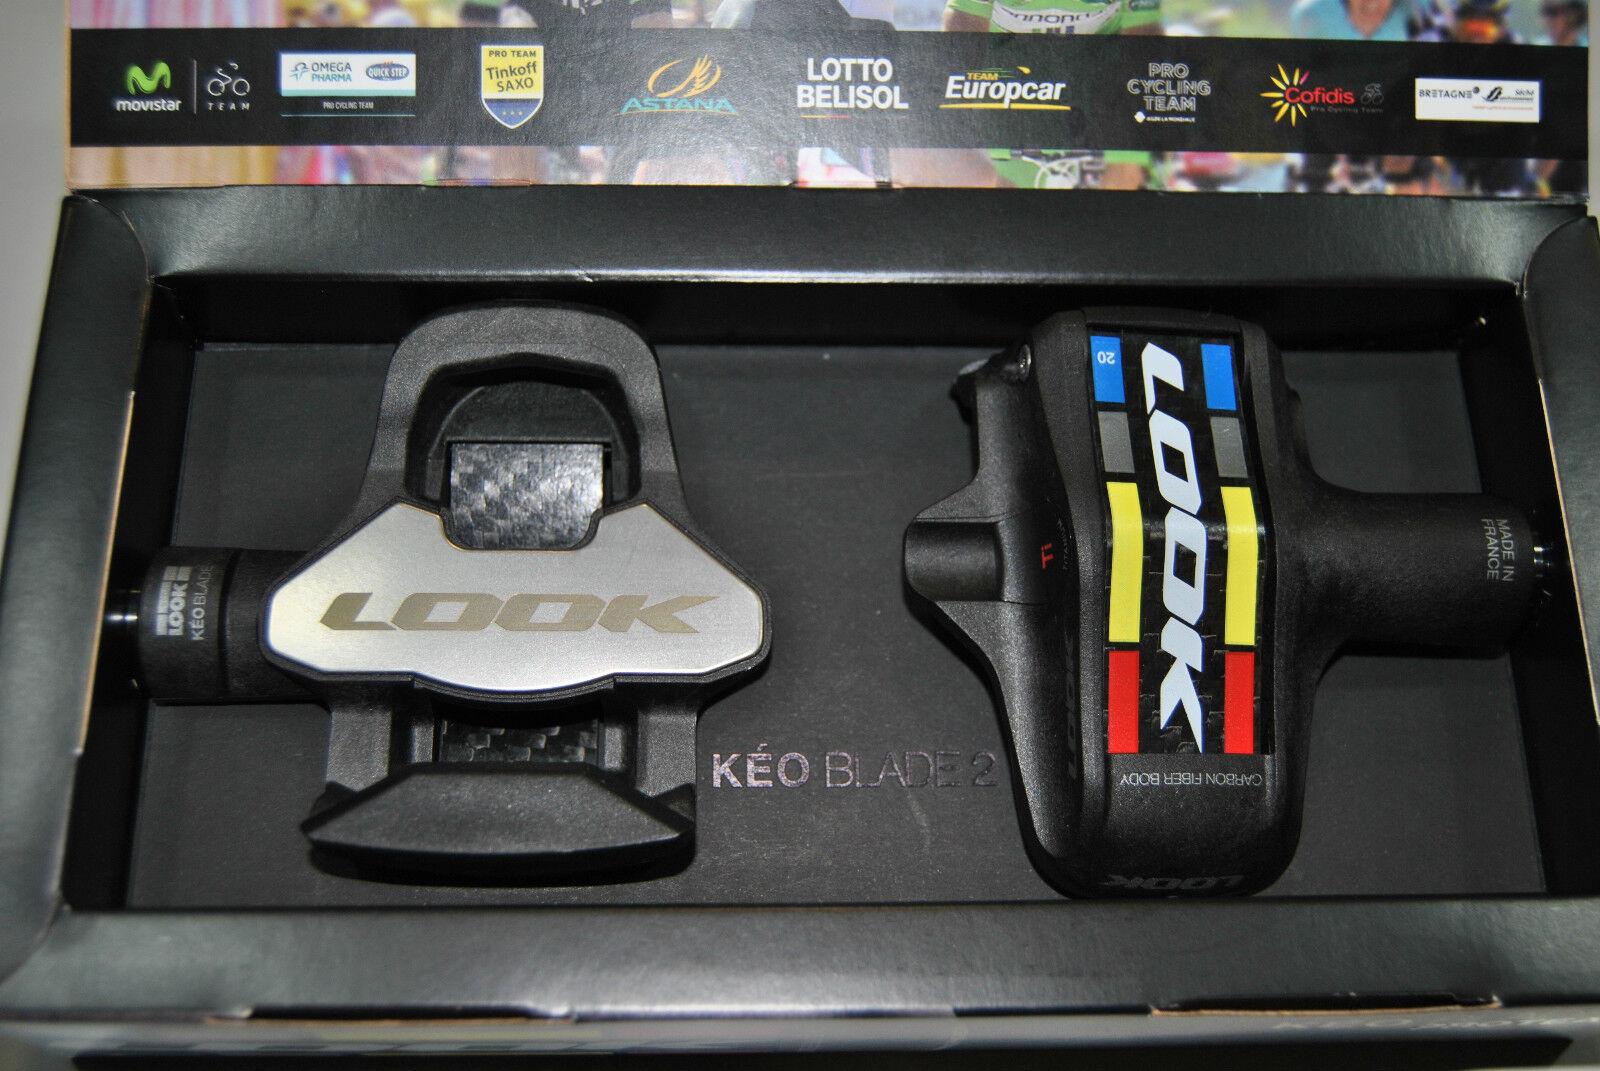 Pedale Rennen Look Keo Blade 2 Proteam Ti Klampe